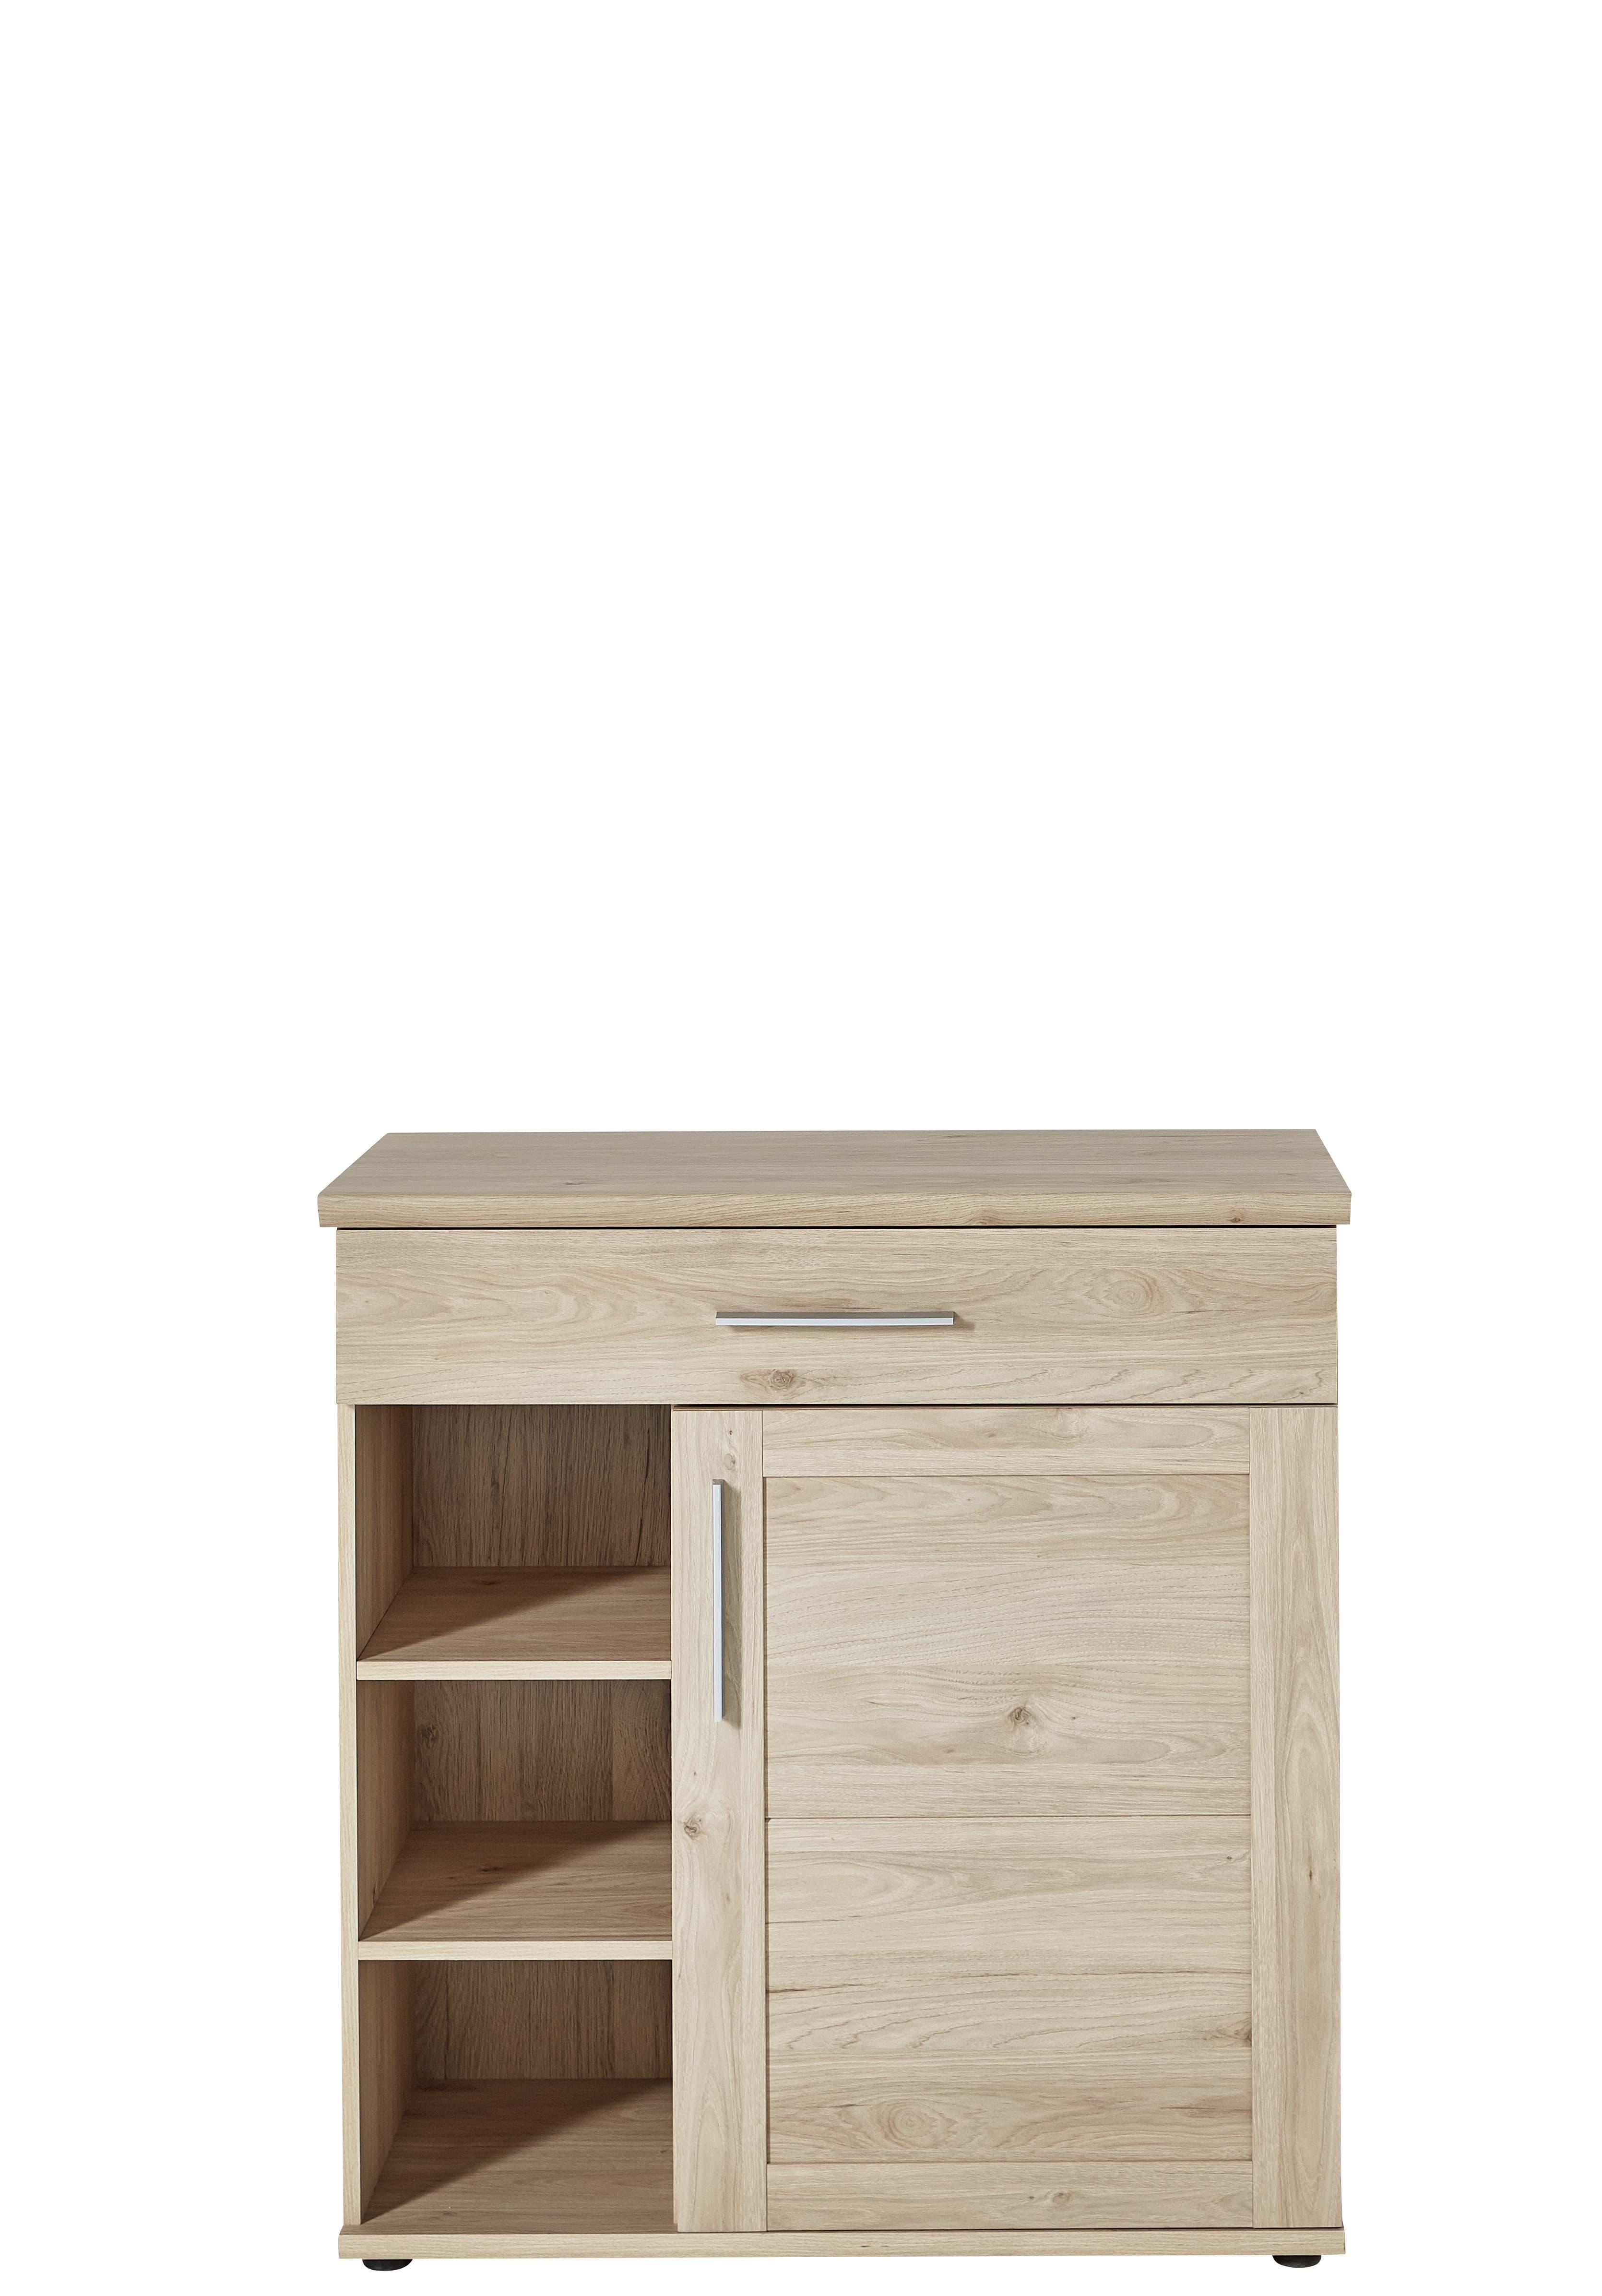 Cabinet hol din pal, cu 1 usa si 1 sertar, Fines Natural, l92xA40xH97 cm imagine